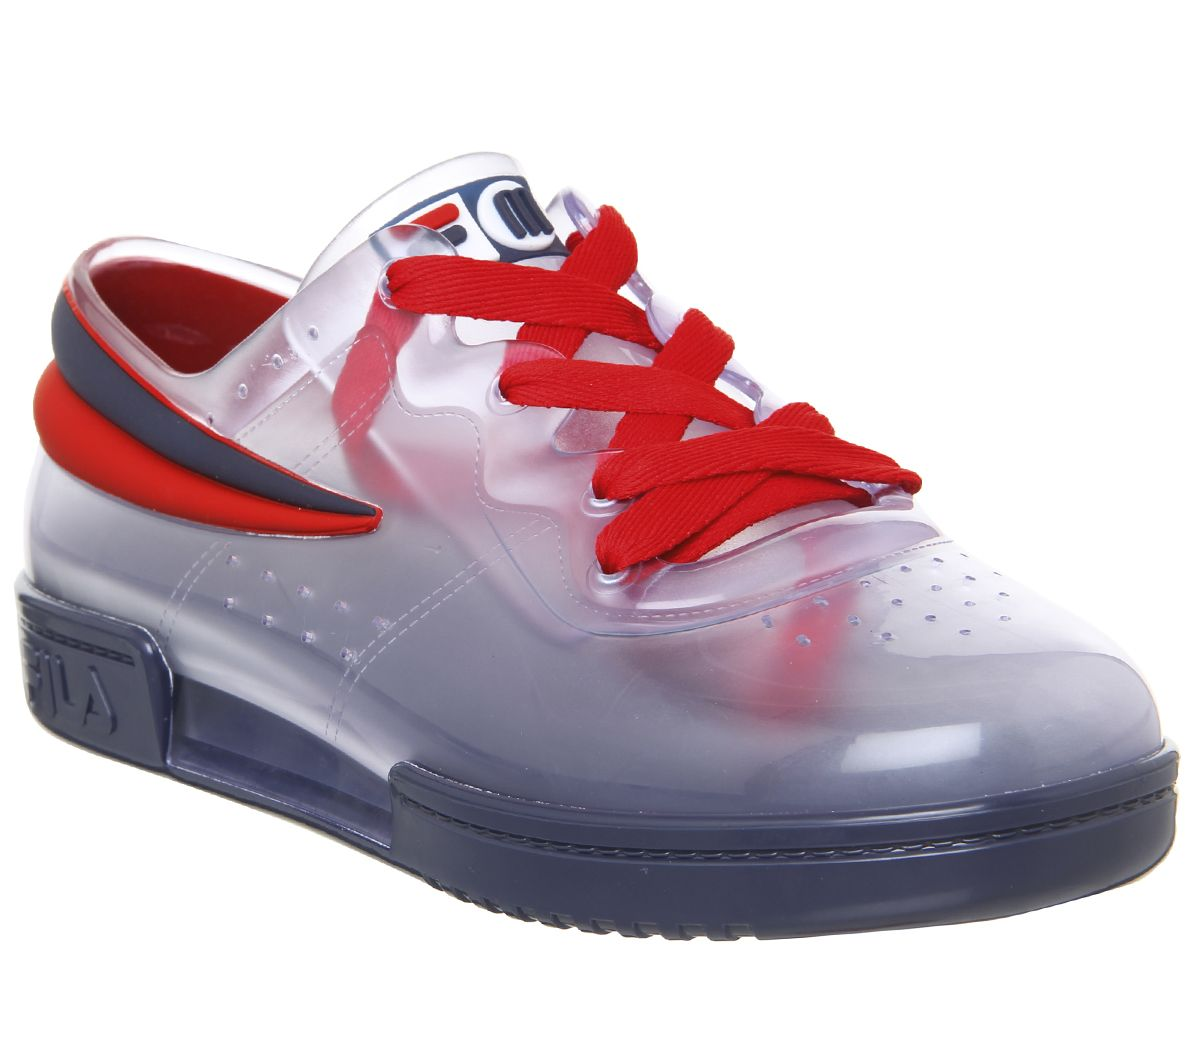 277d4e75f7e176 Sentinel Womens Melissa Melissa X Fila Sneakers Clear Trainers Shoes